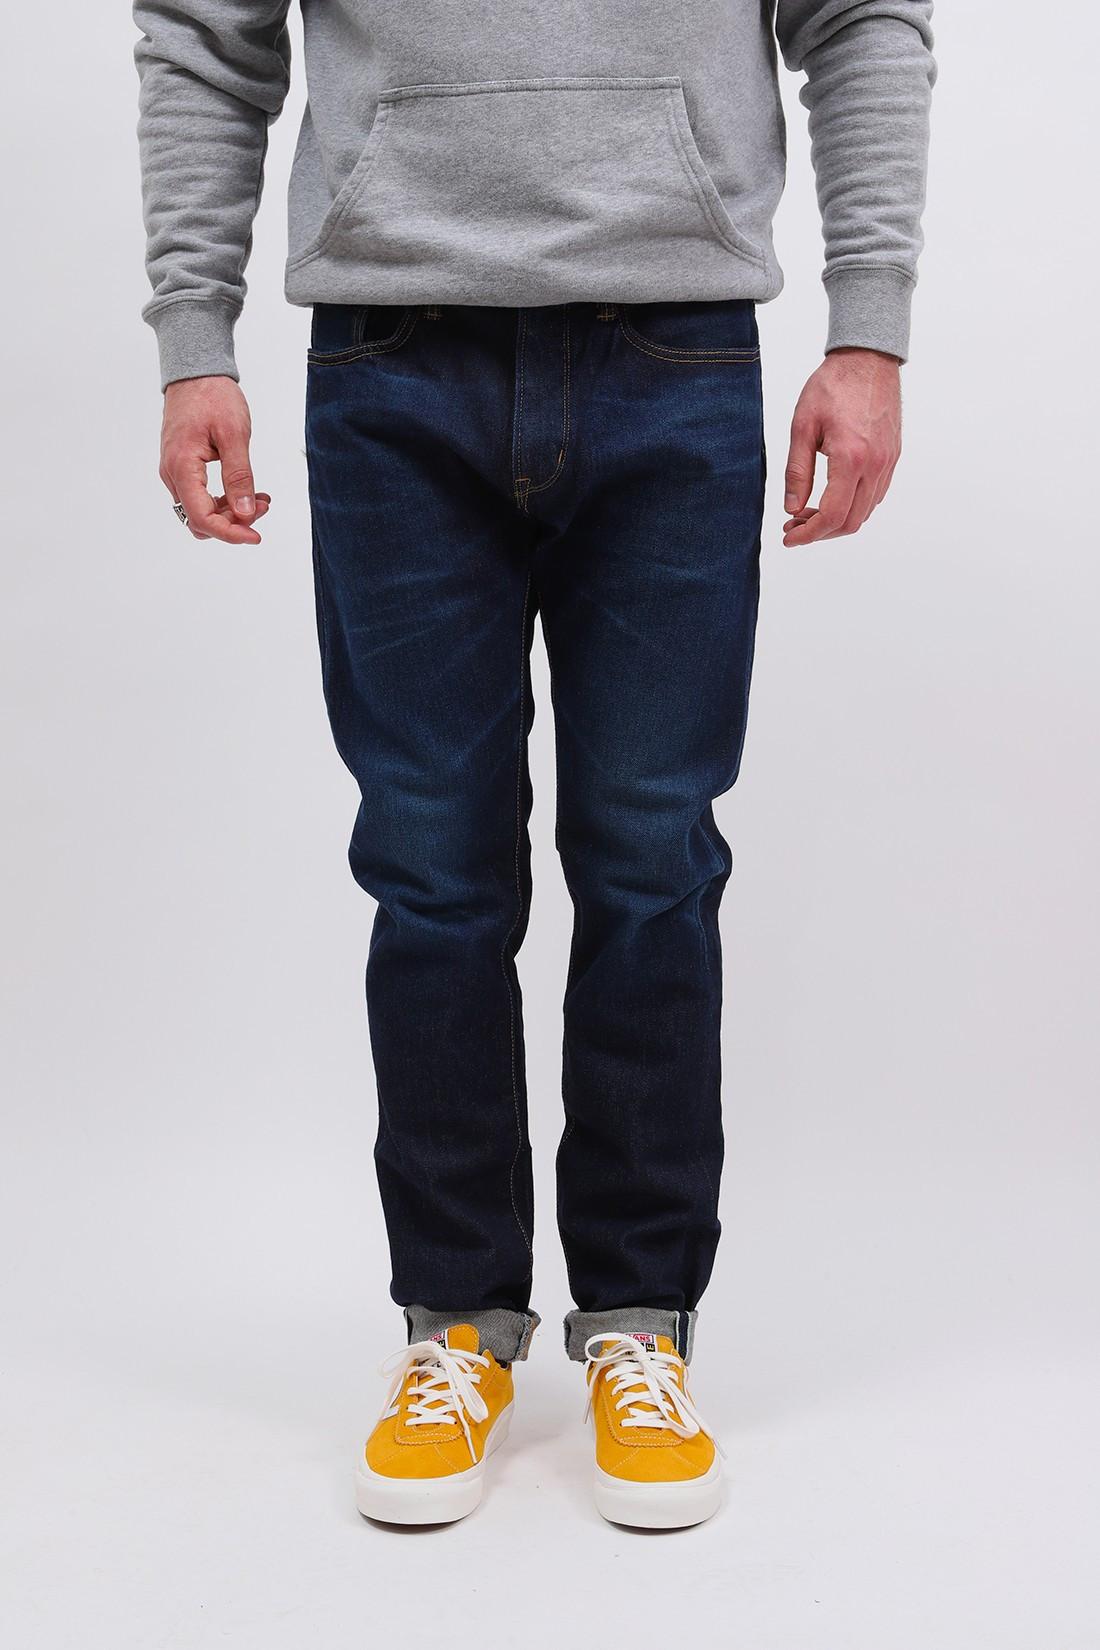 EDWIN / Slim tapered kaihara stretch Blue dark used